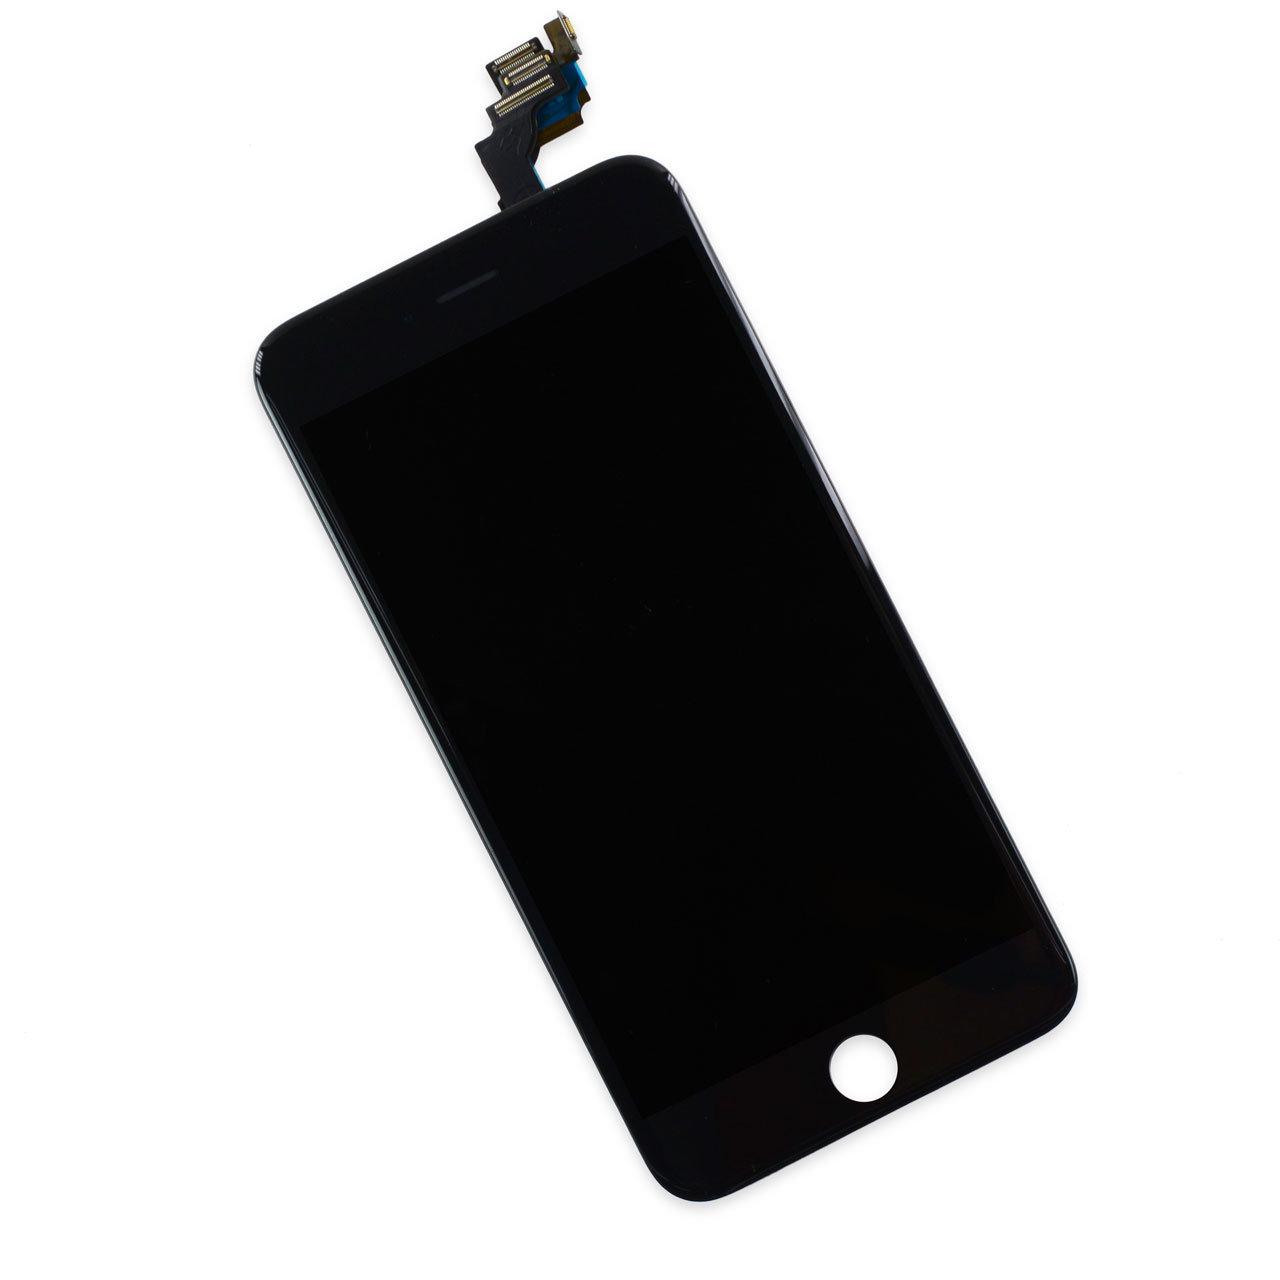 iPhone 6 Plus Black Screen Replacement